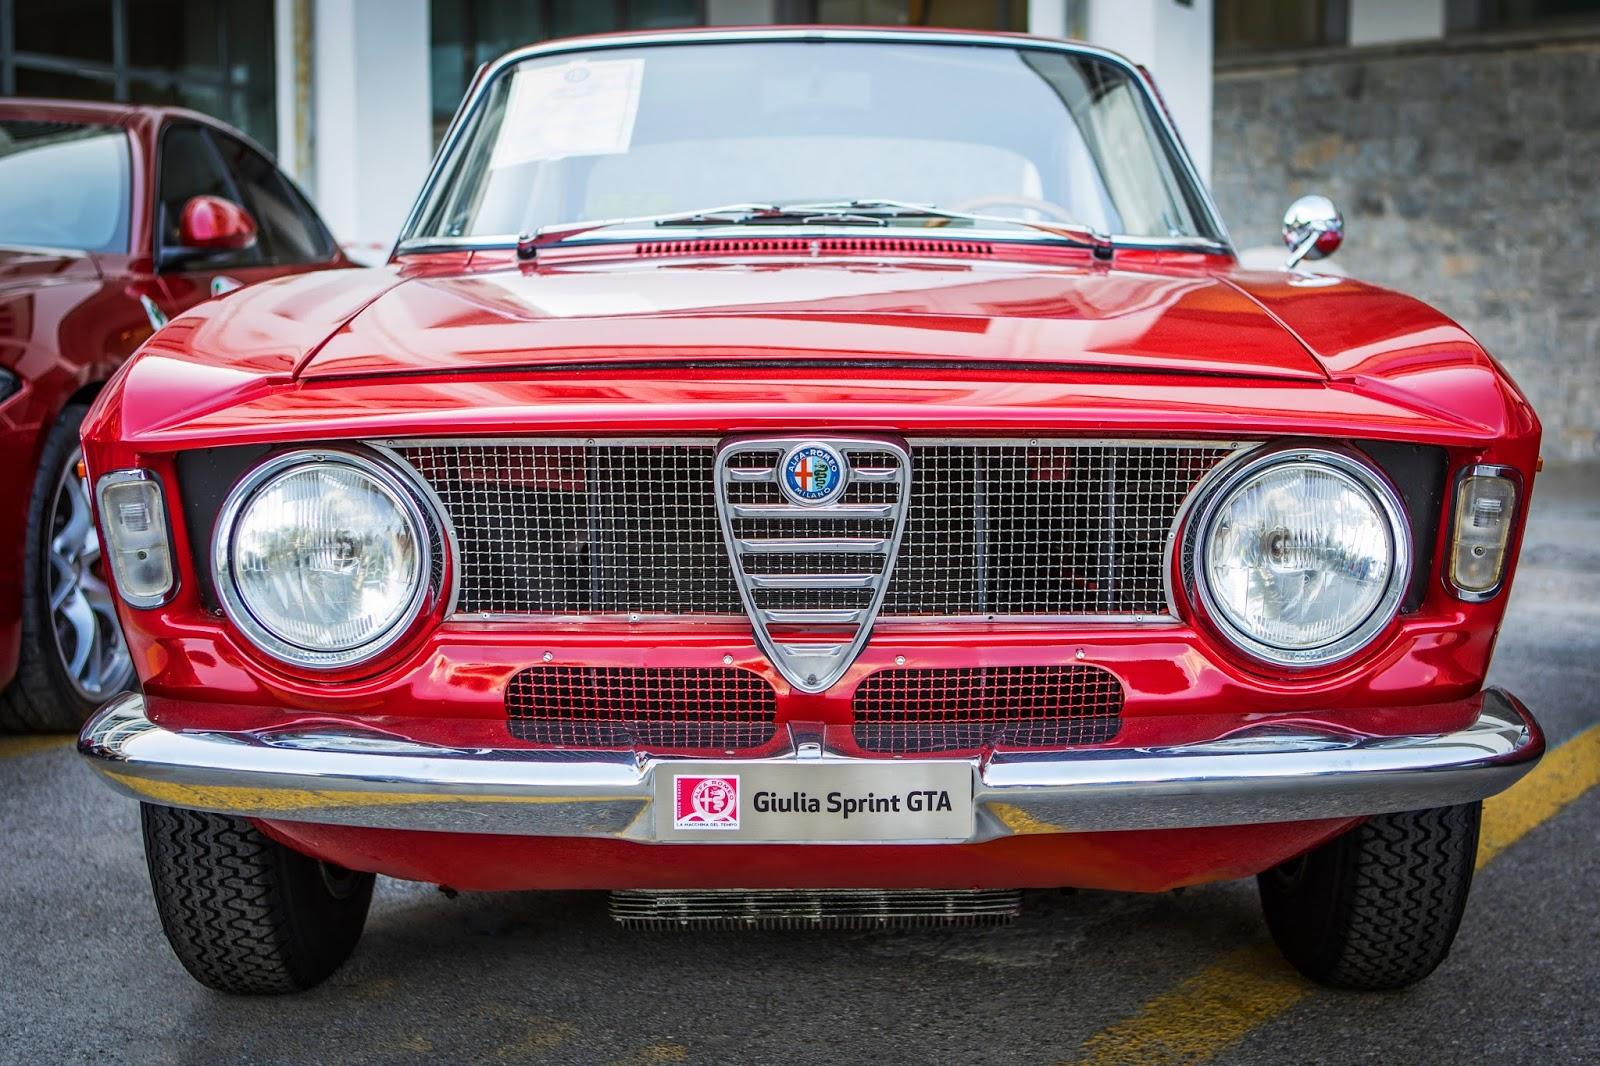 170420 Alfa Romeo On Air 08 H 1960 Giulietta SZ στο 101ο Targa Florio Alfa, alfa romeo, Alfa Romeo Giulietta, Alfa Romeo Giulietta SZ, Classic, Targa Florio, videos, αγωνες